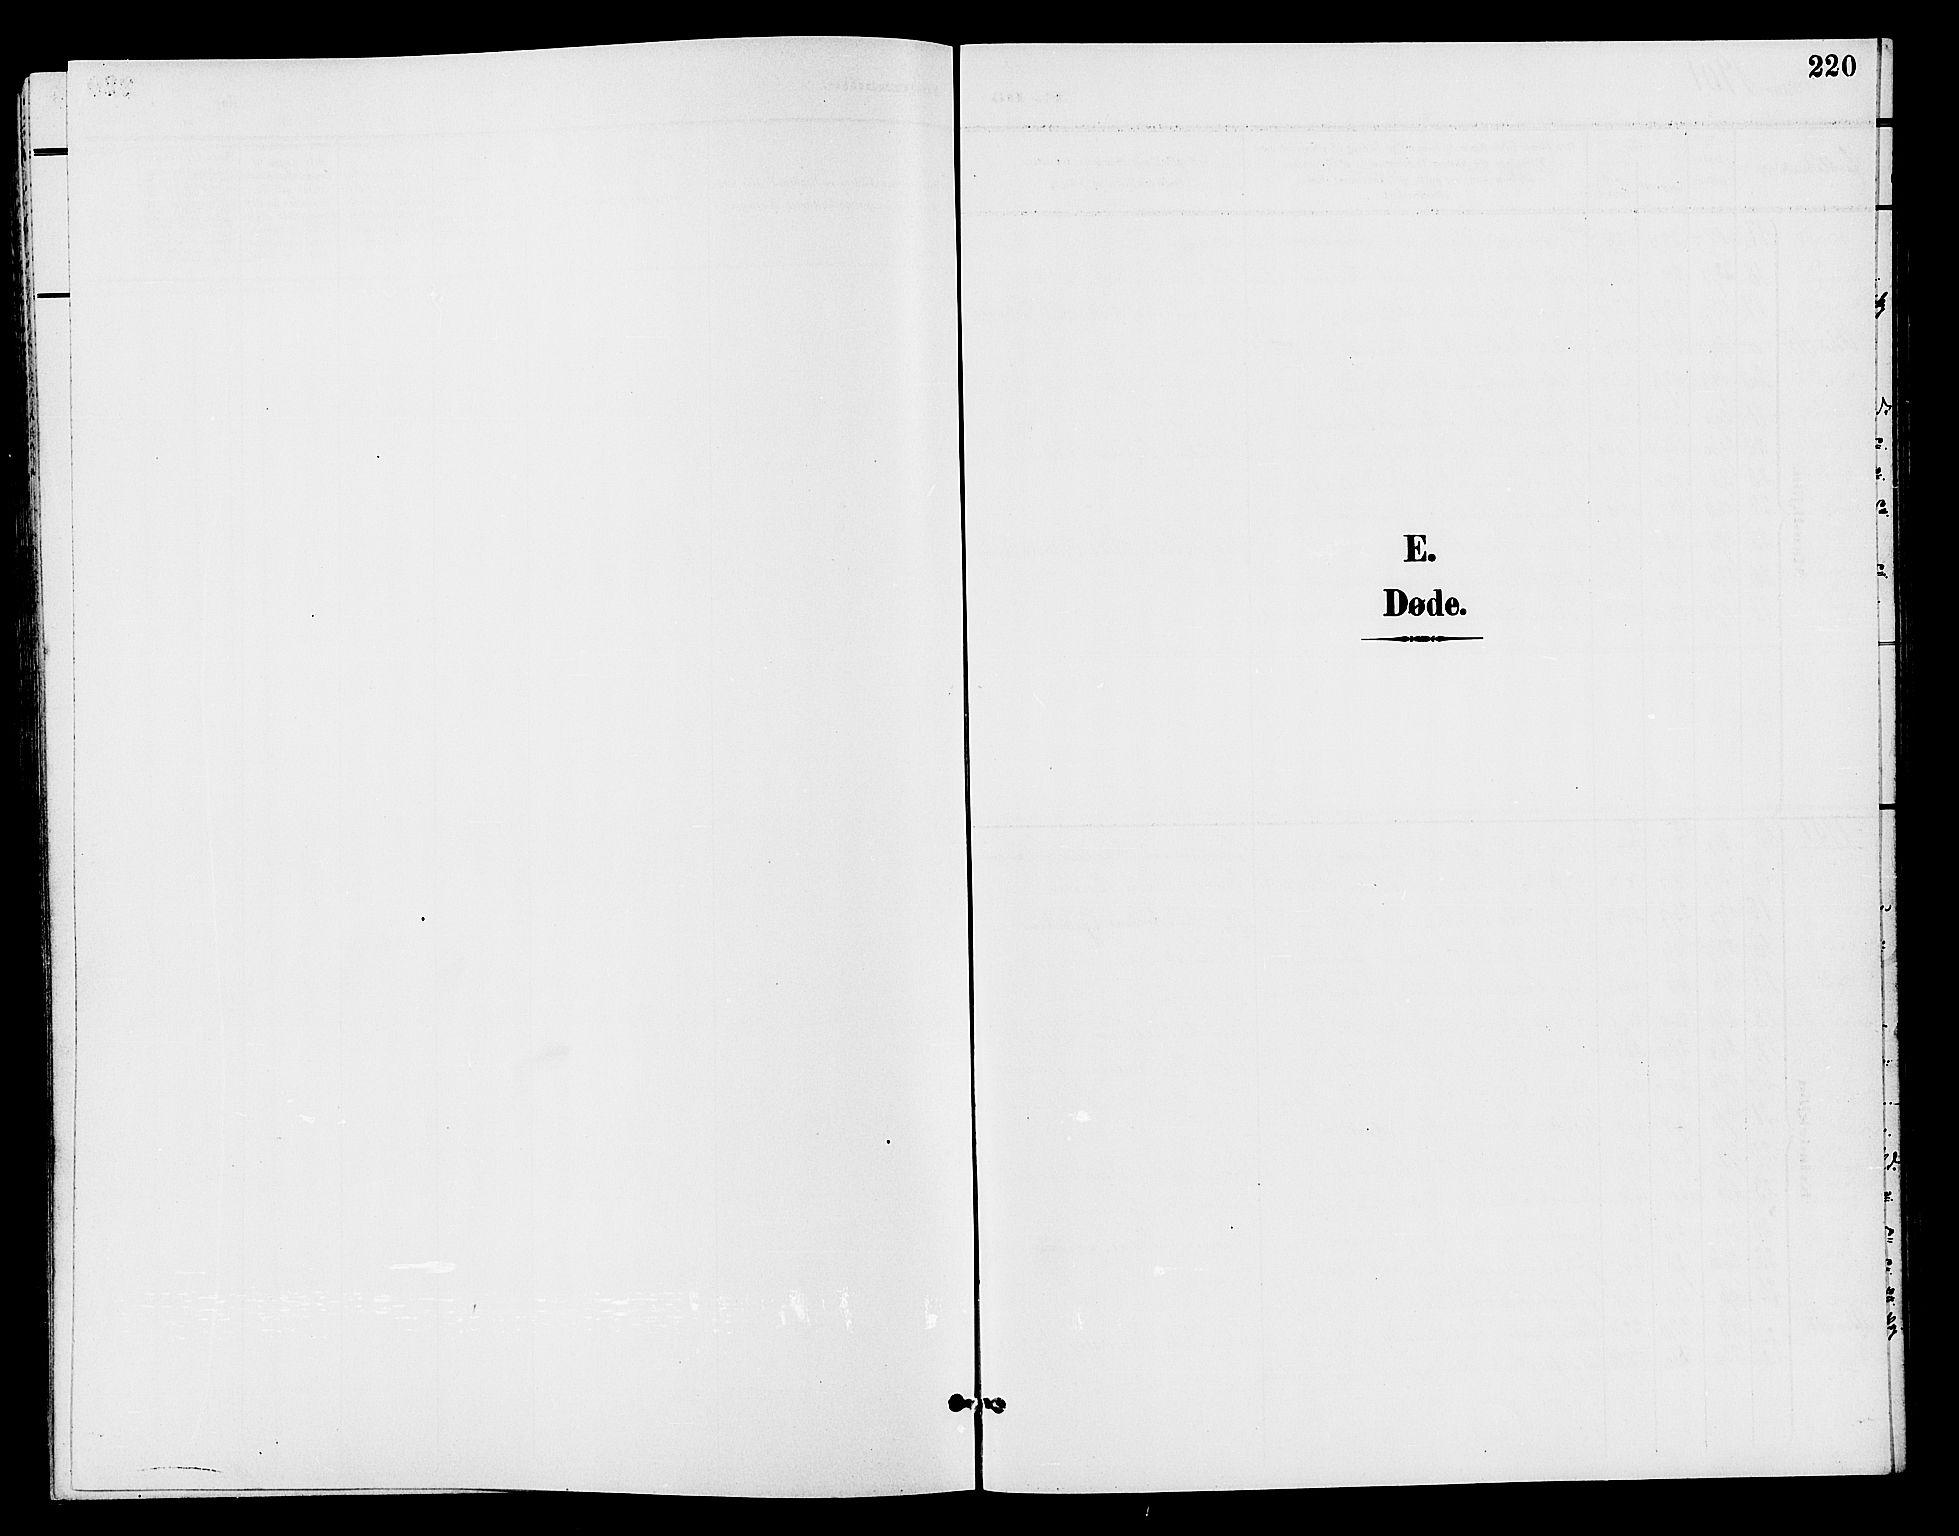 SAH, Østre Toten prestekontor, Klokkerbok nr. 7, 1901-1912, s. 220